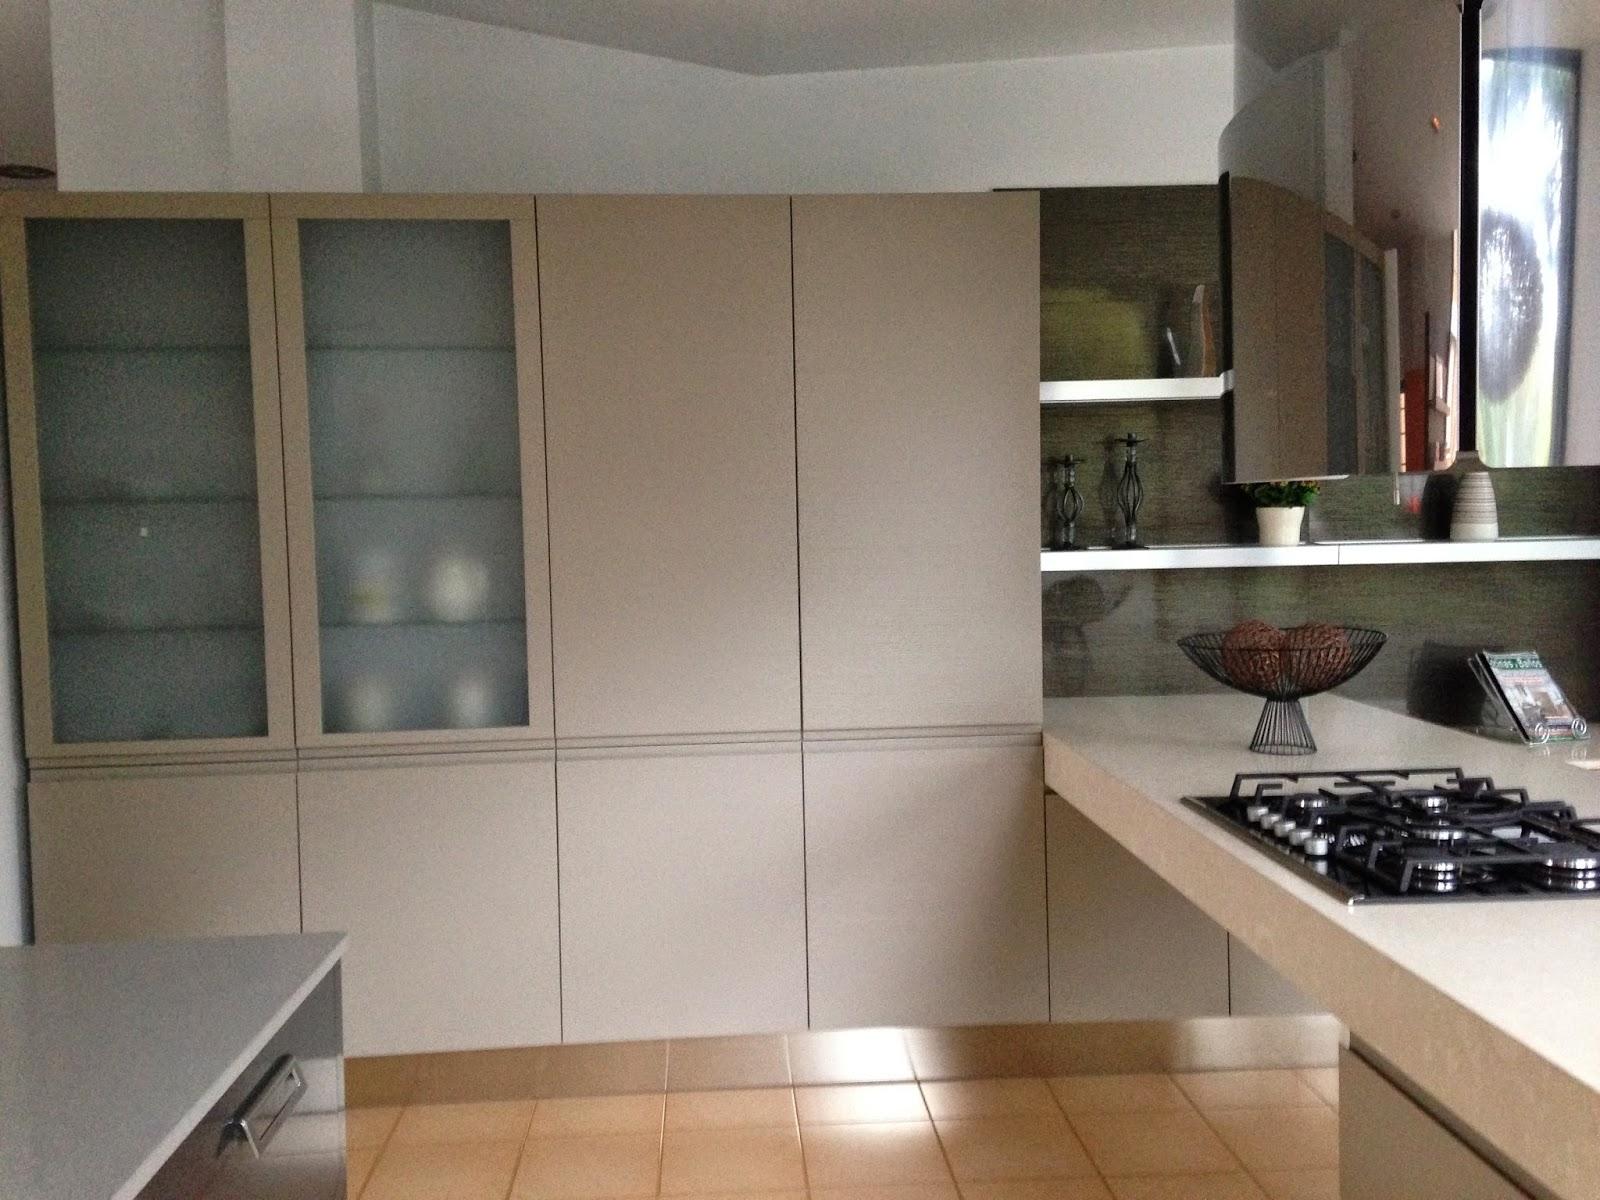 Getxoreformas D A A D A # Xp Muebles De Cocina